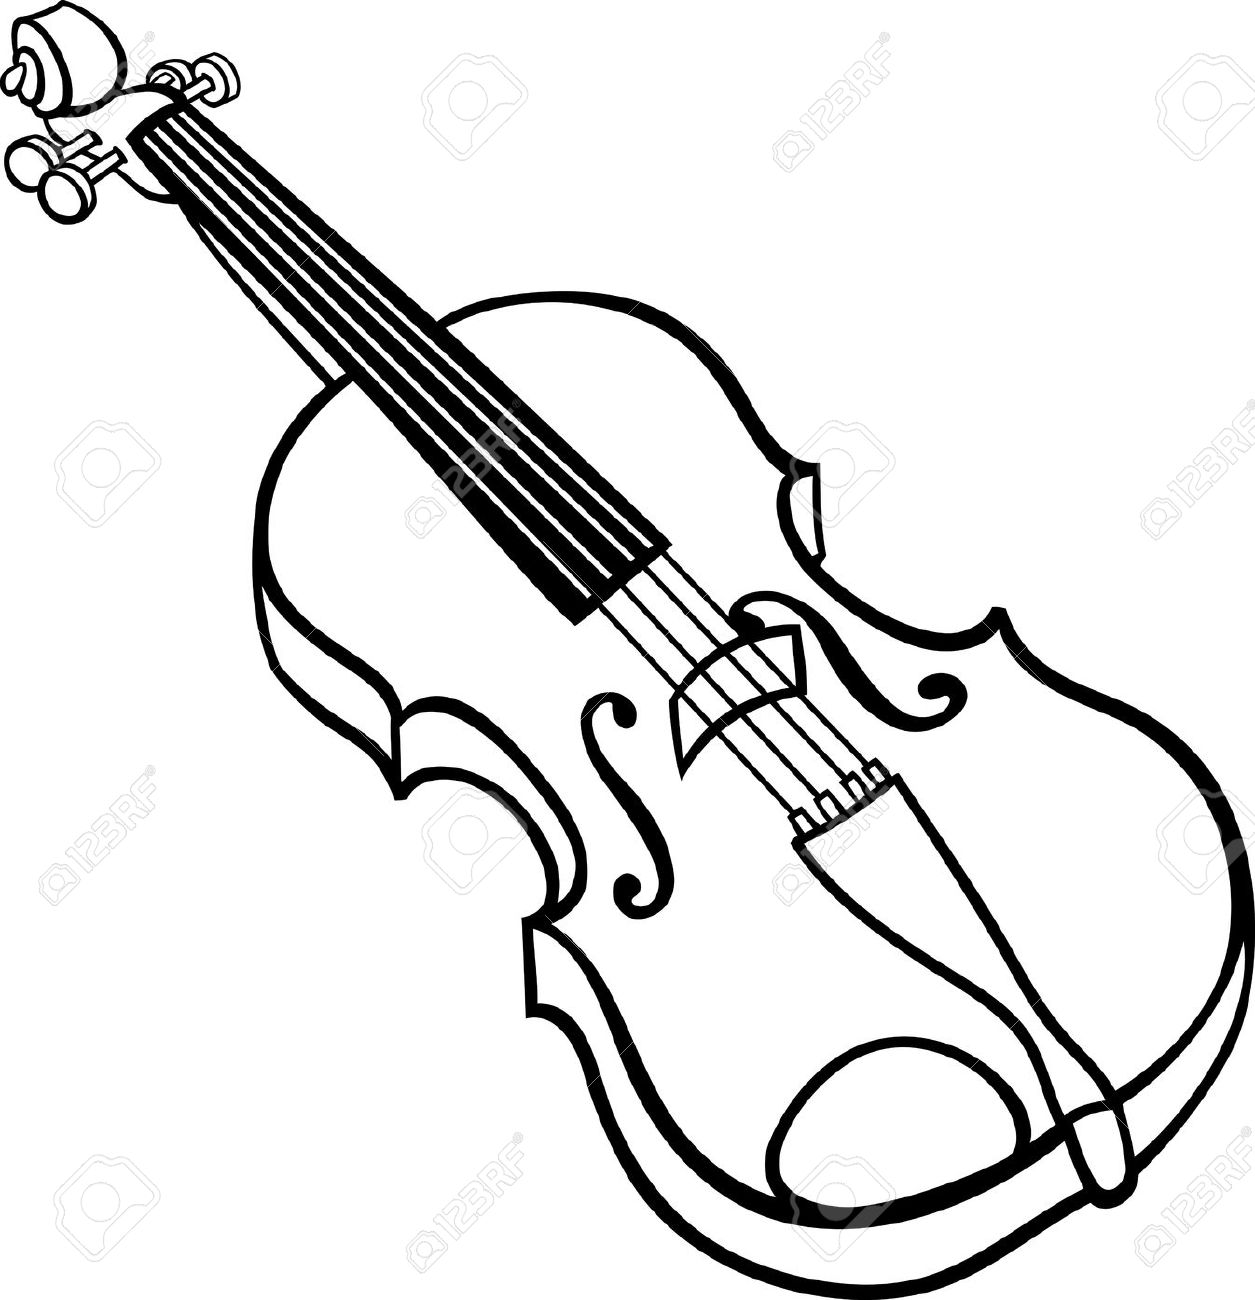 Violin Black And White Clipart. Black An-Violin Black And White Clipart. Black and White Cartoon .-10